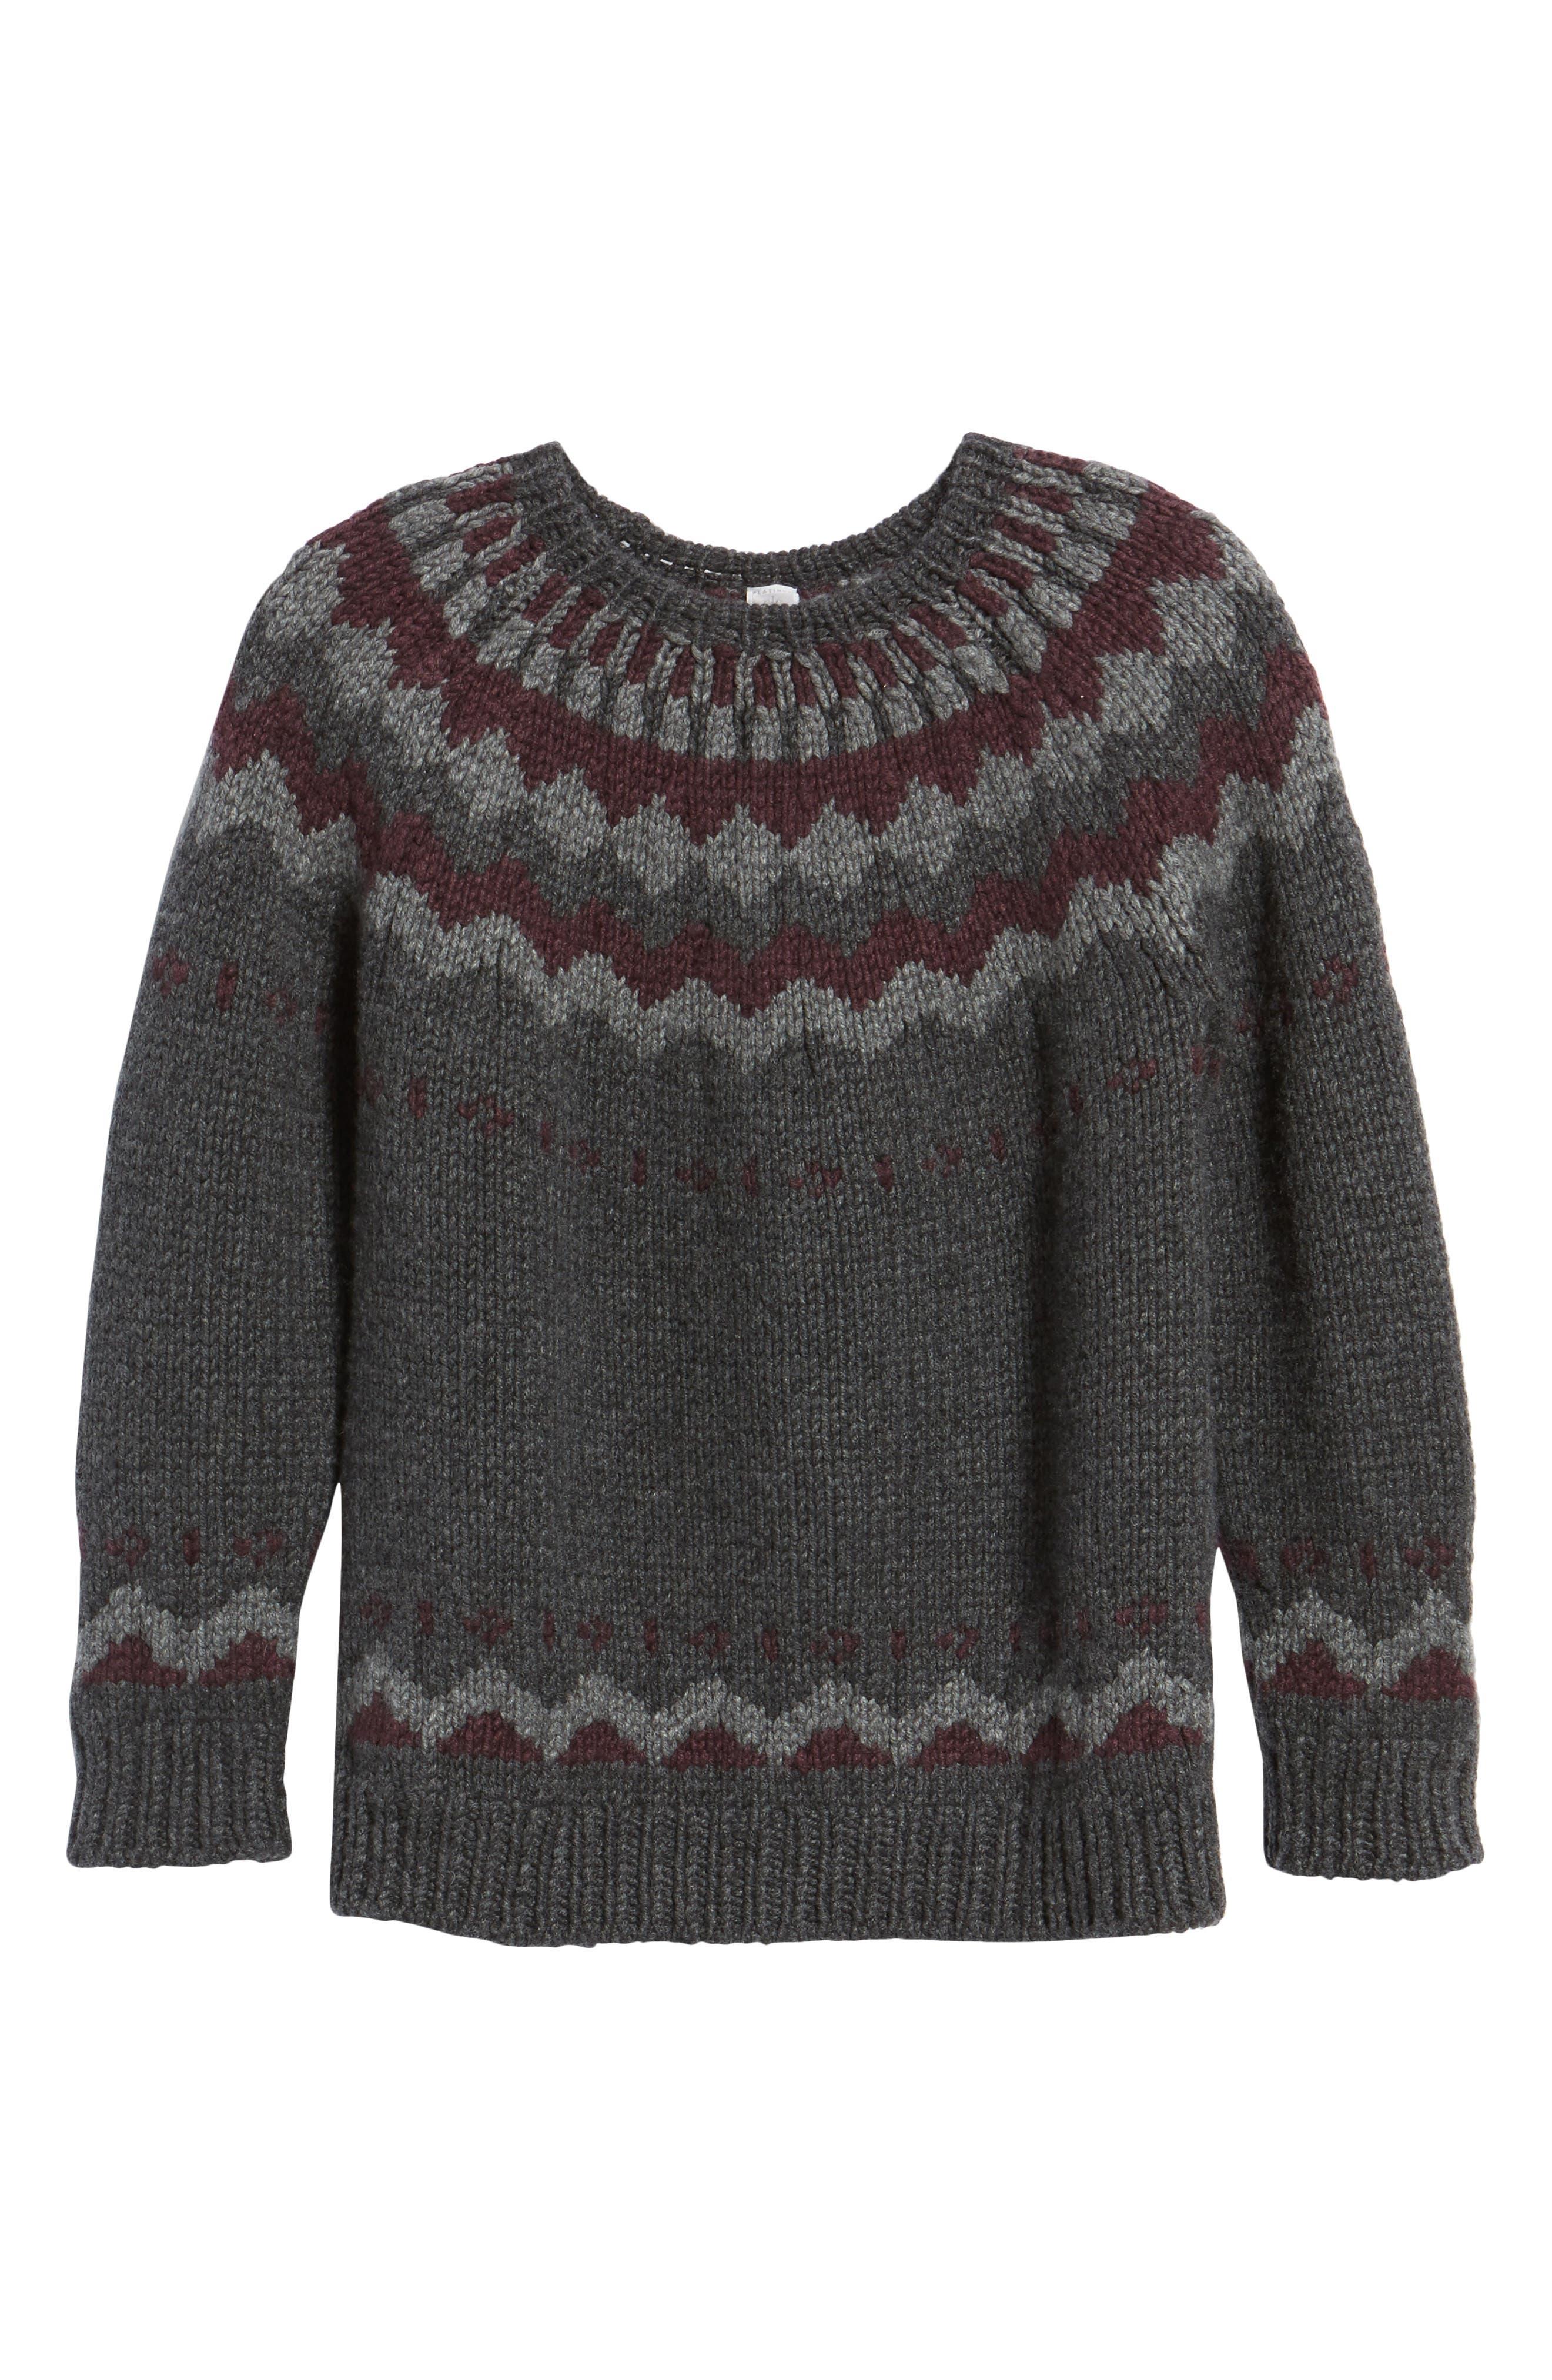 Intarsia Cashmere Sweater,                             Alternate thumbnail 6, color,                             035